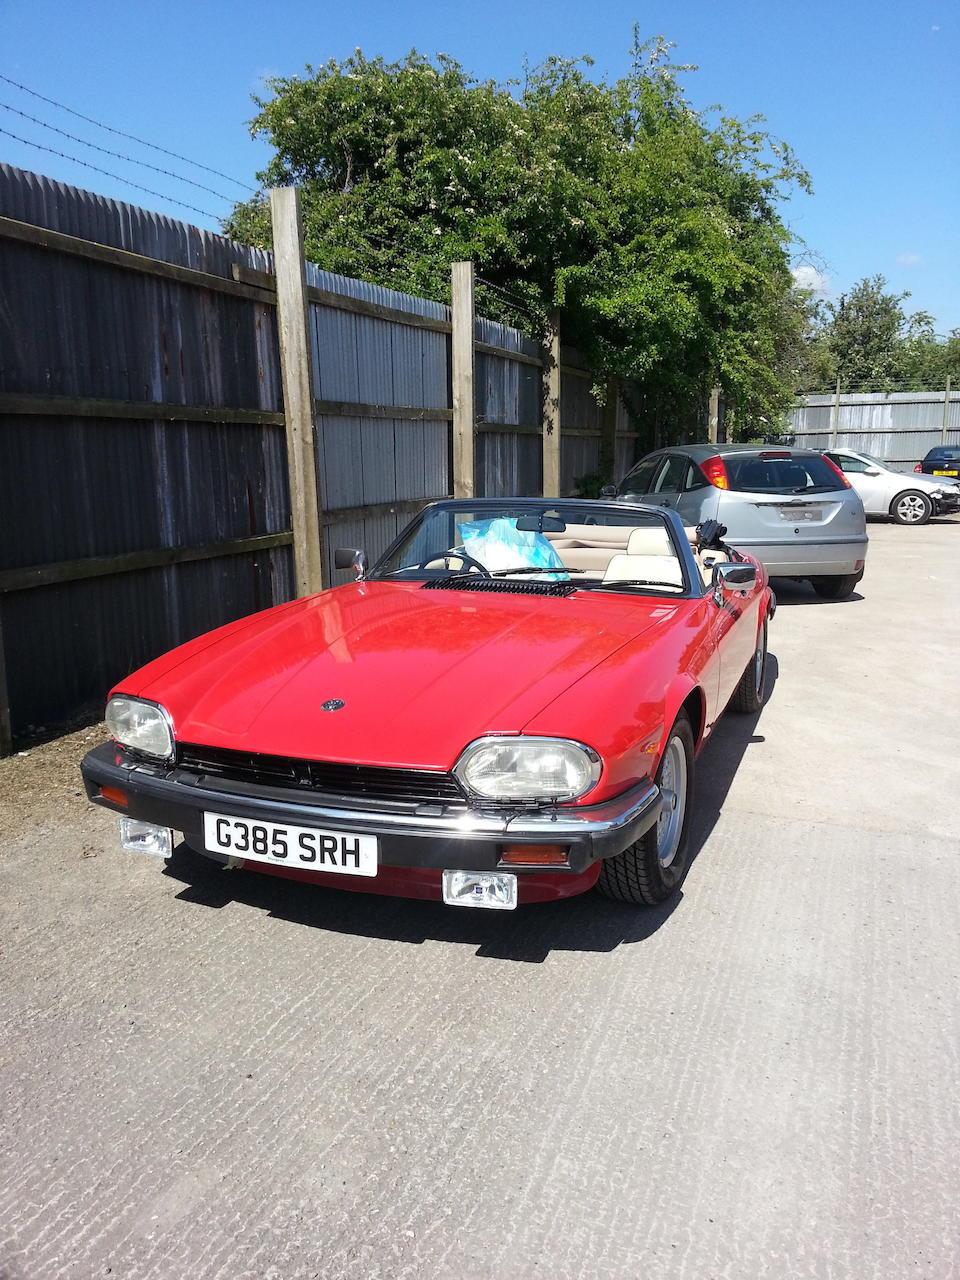 1990 Jaguar XJ-S V12 Convertible  Chassis no. SAJJNADW3DB171899 Engine no. 8S 076008 SB